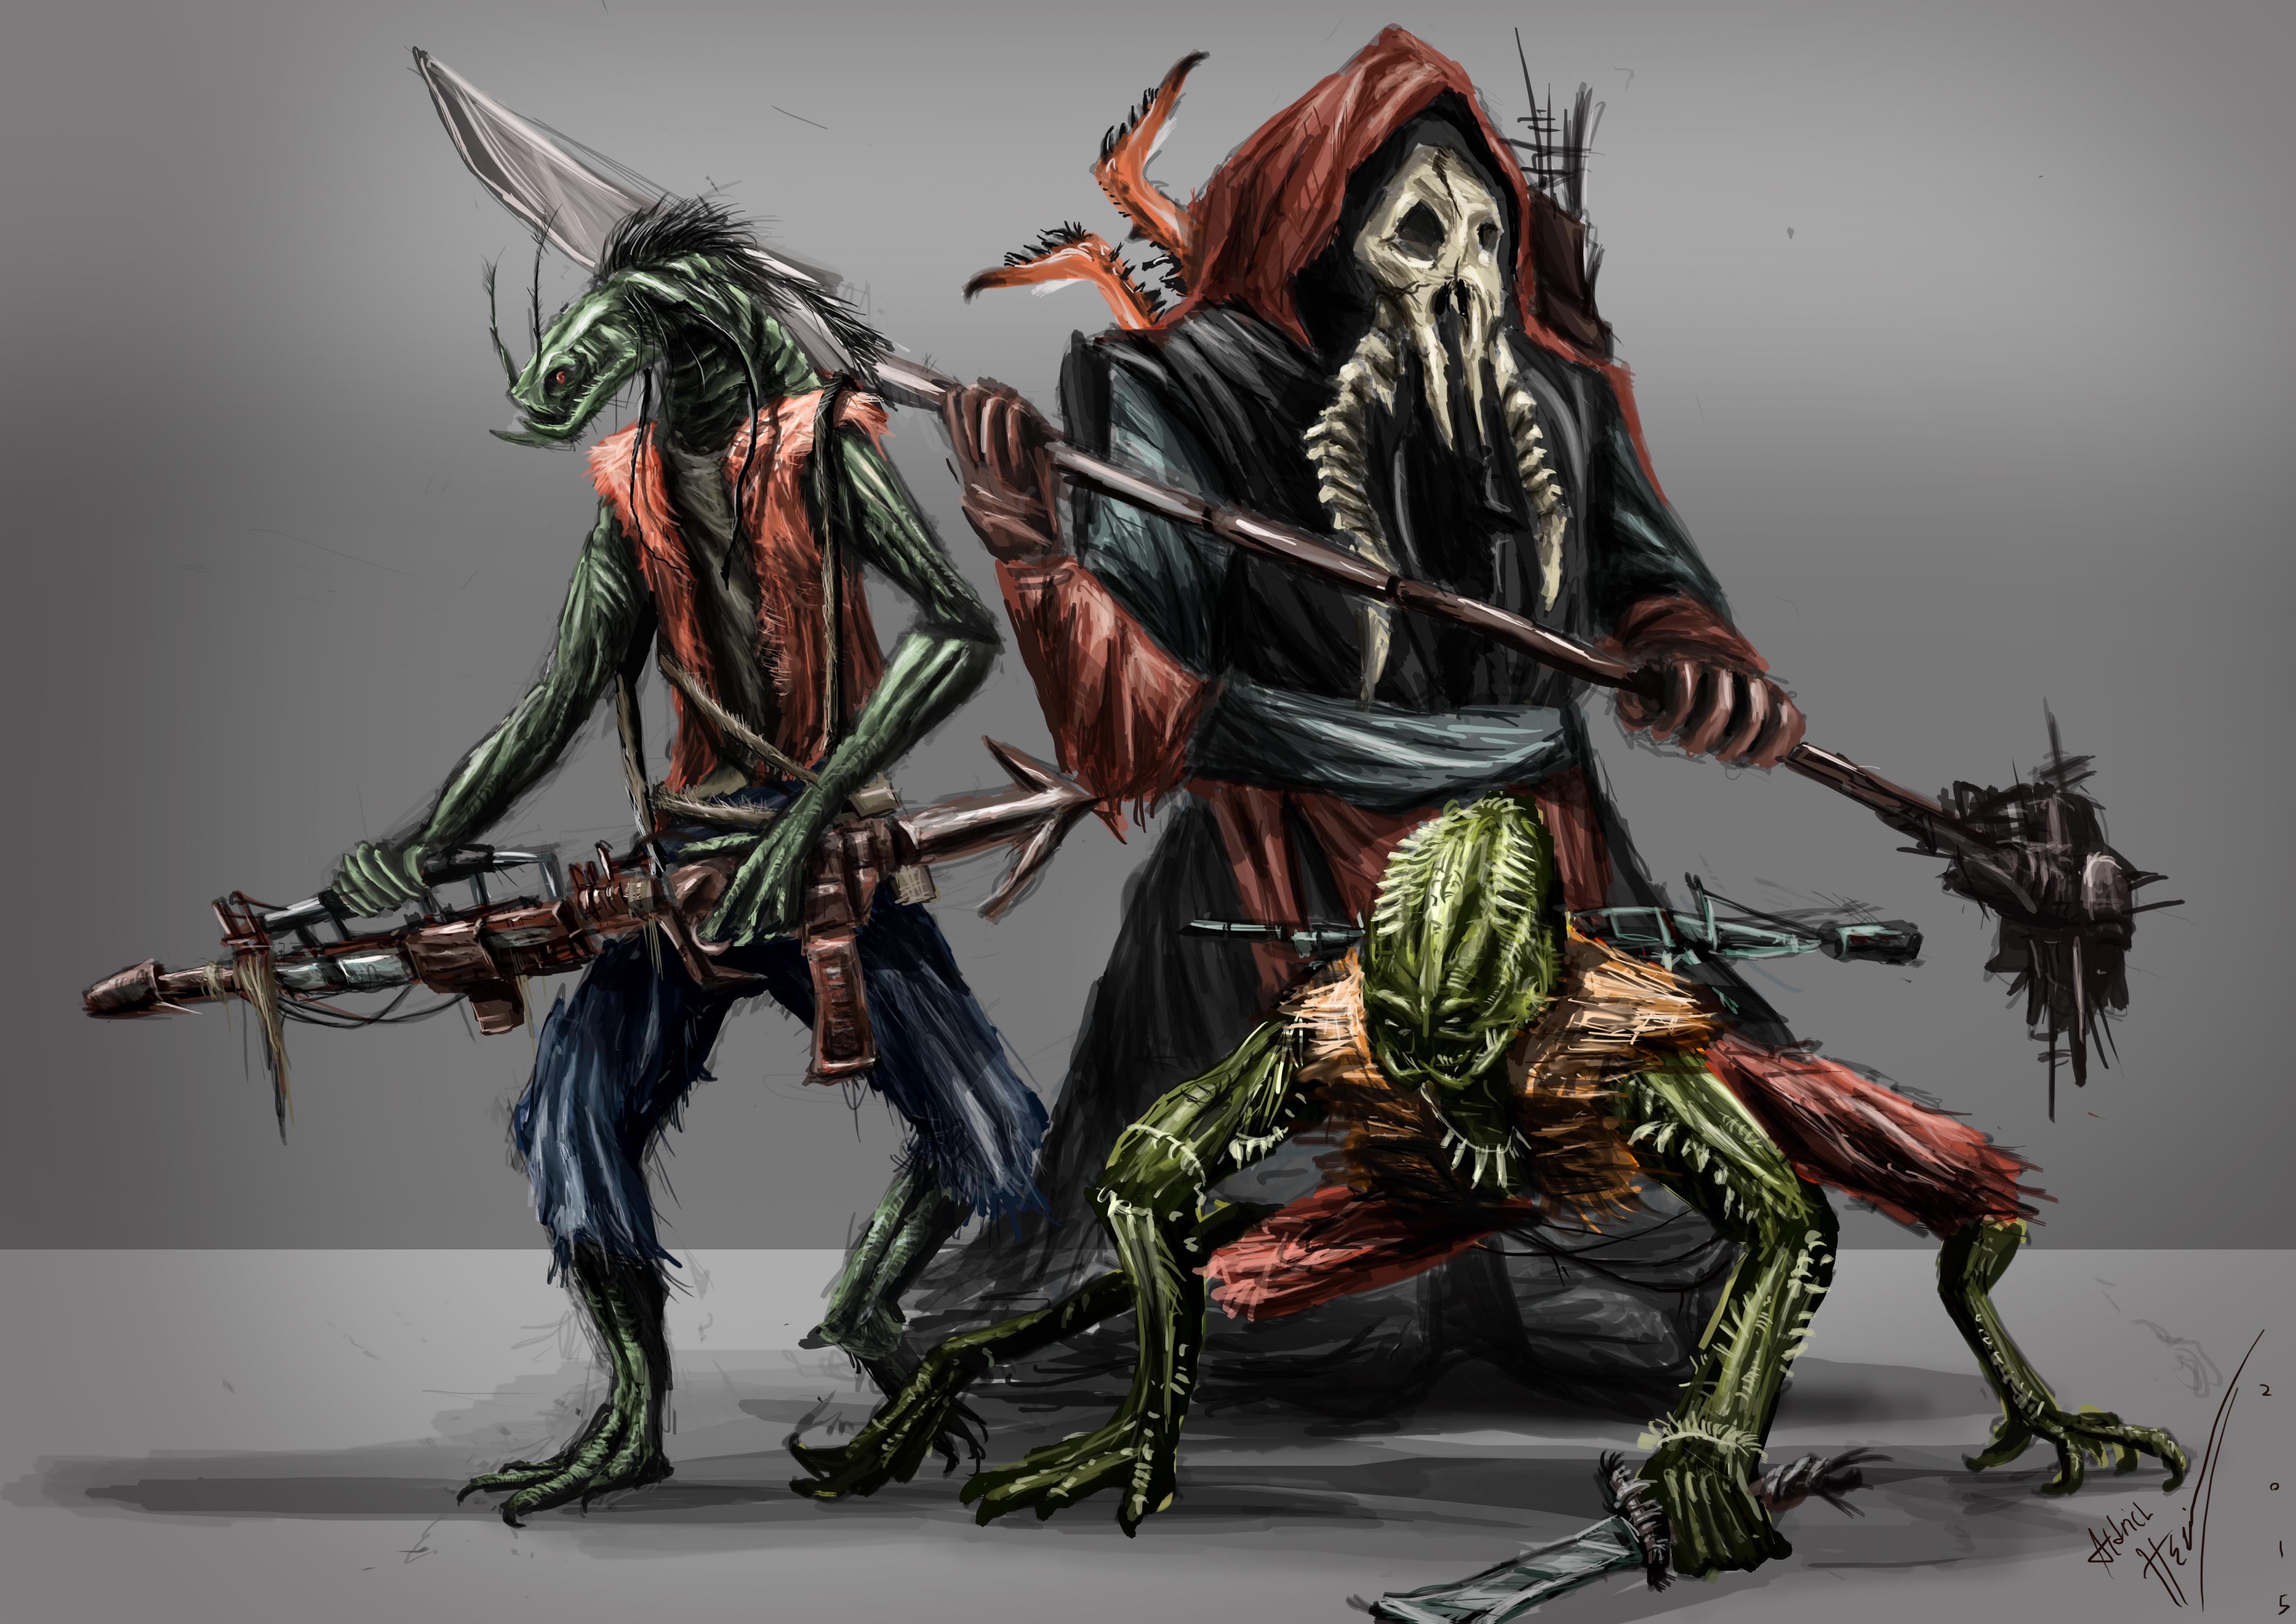 miasmic mercenaries